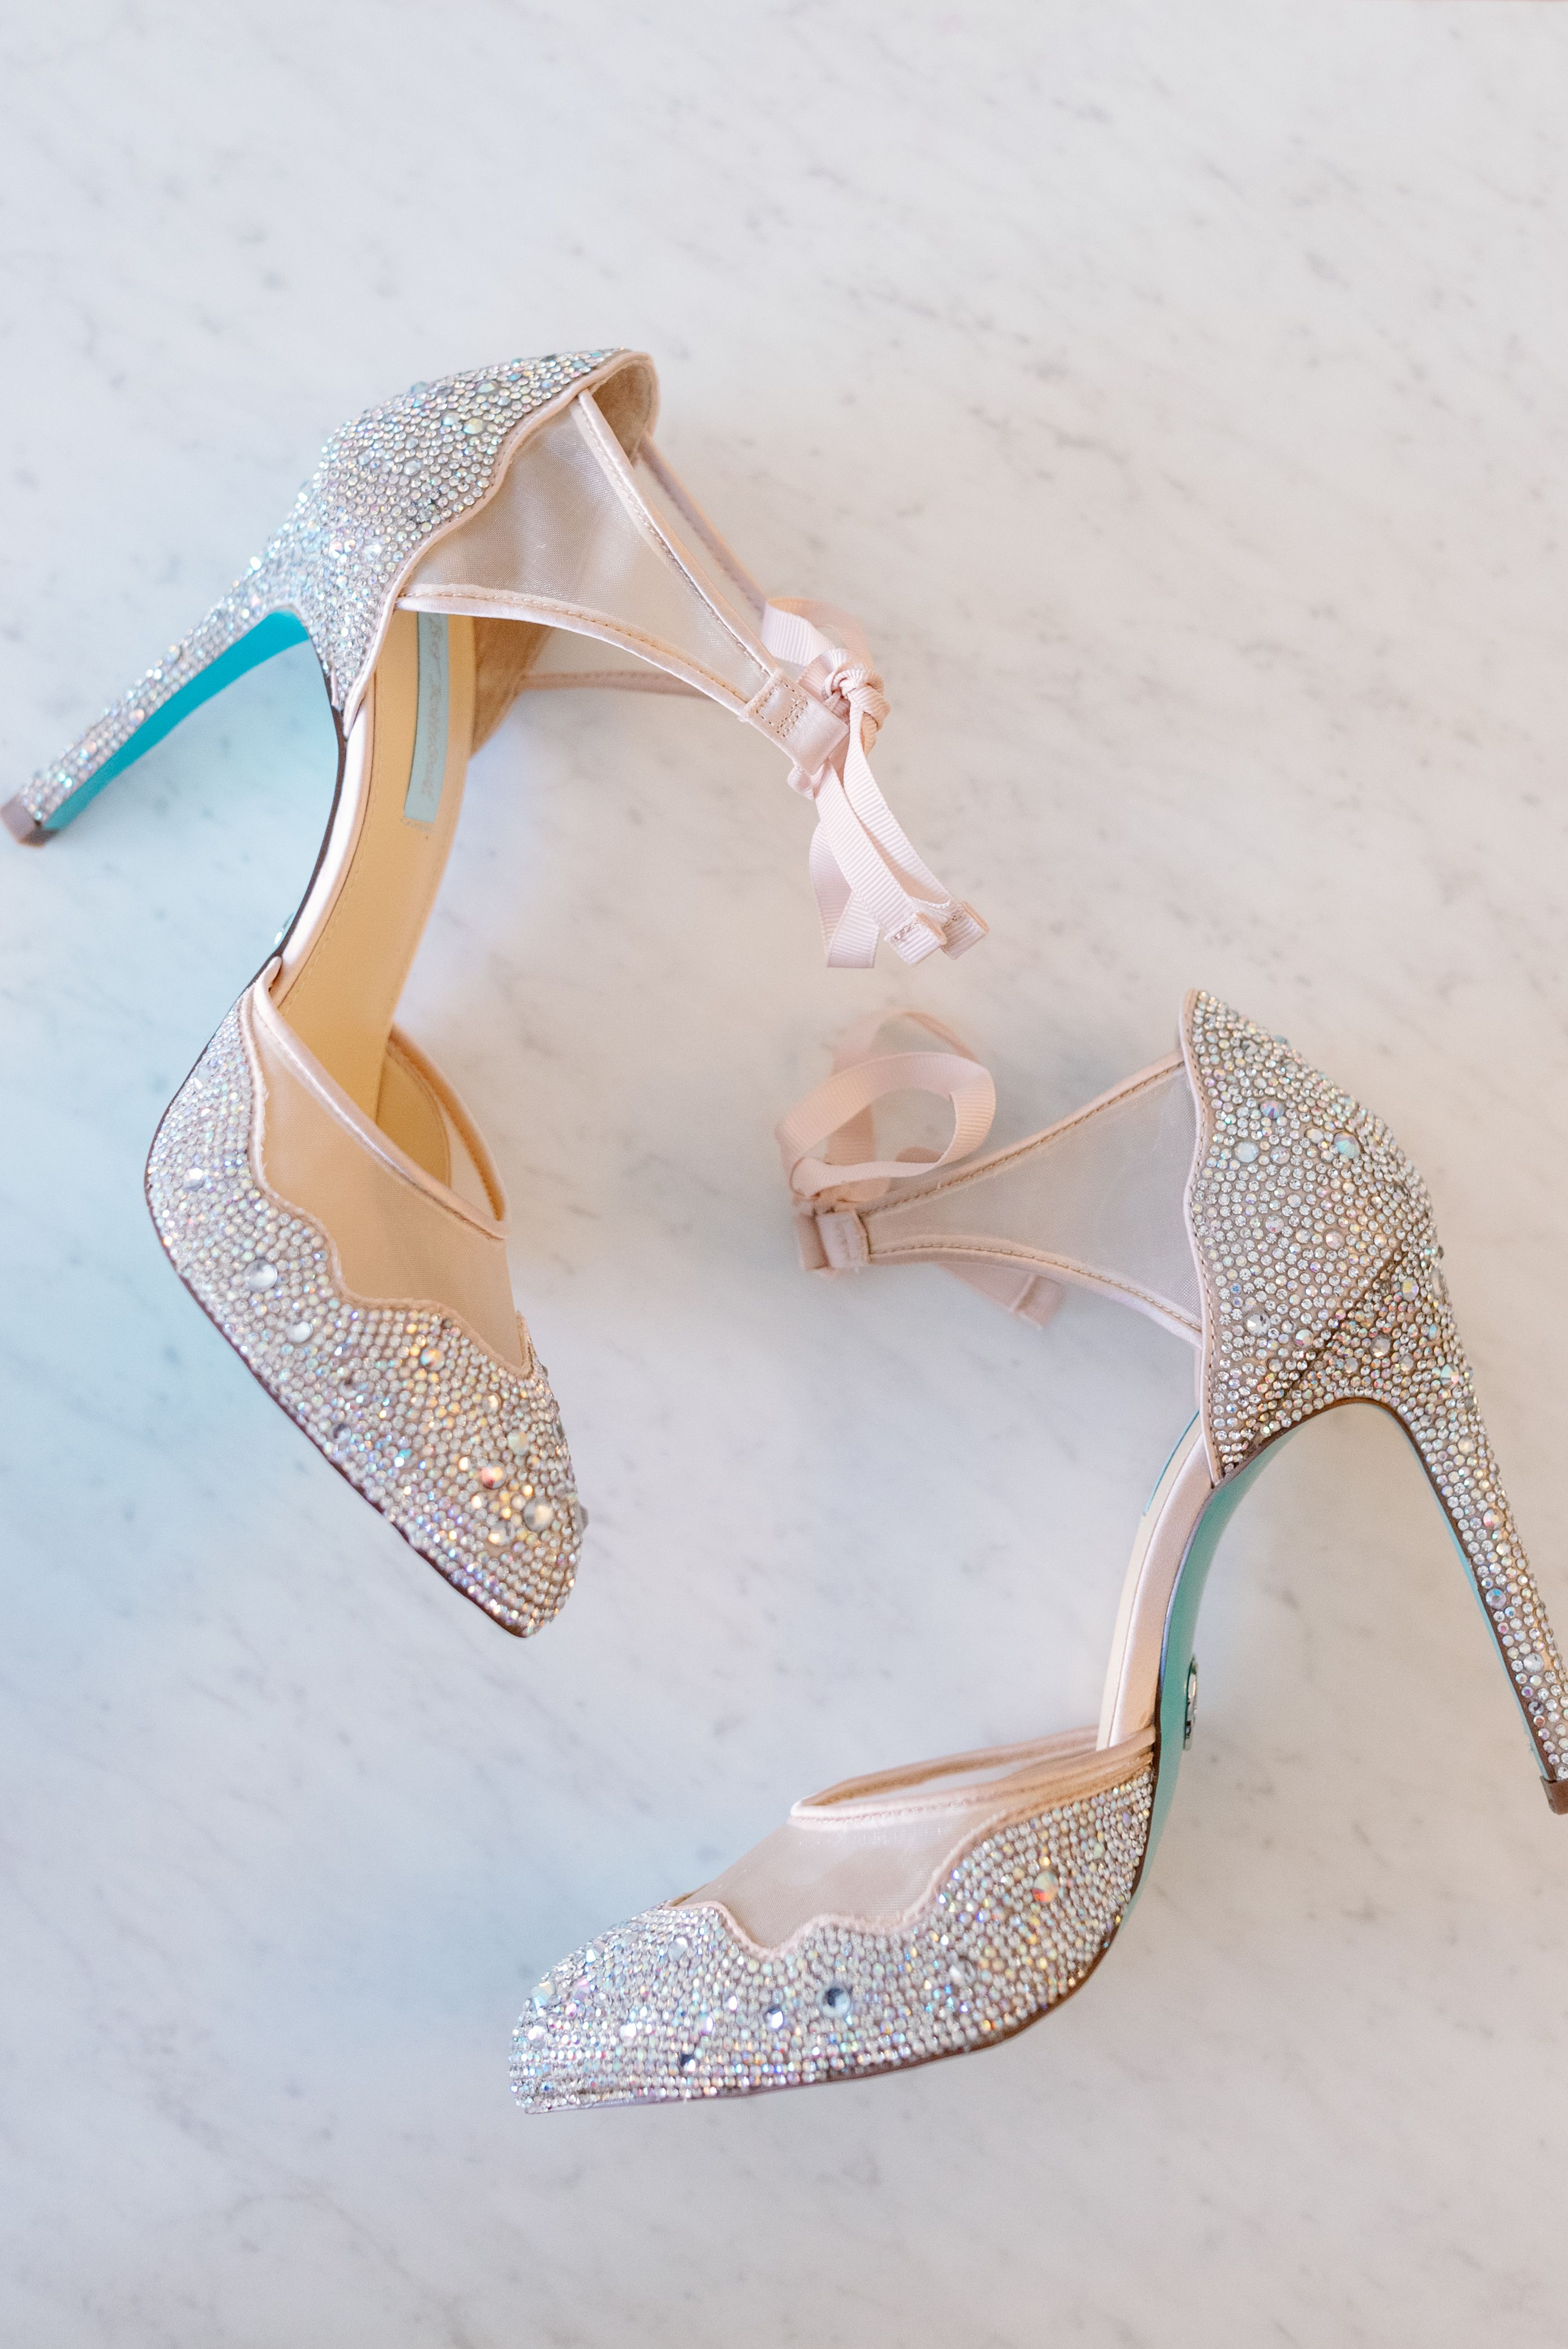 Sparkly Wedding Shoes In 2020 Sparkly Wedding Heels Wedding Shoes Wedding Shoes Heels